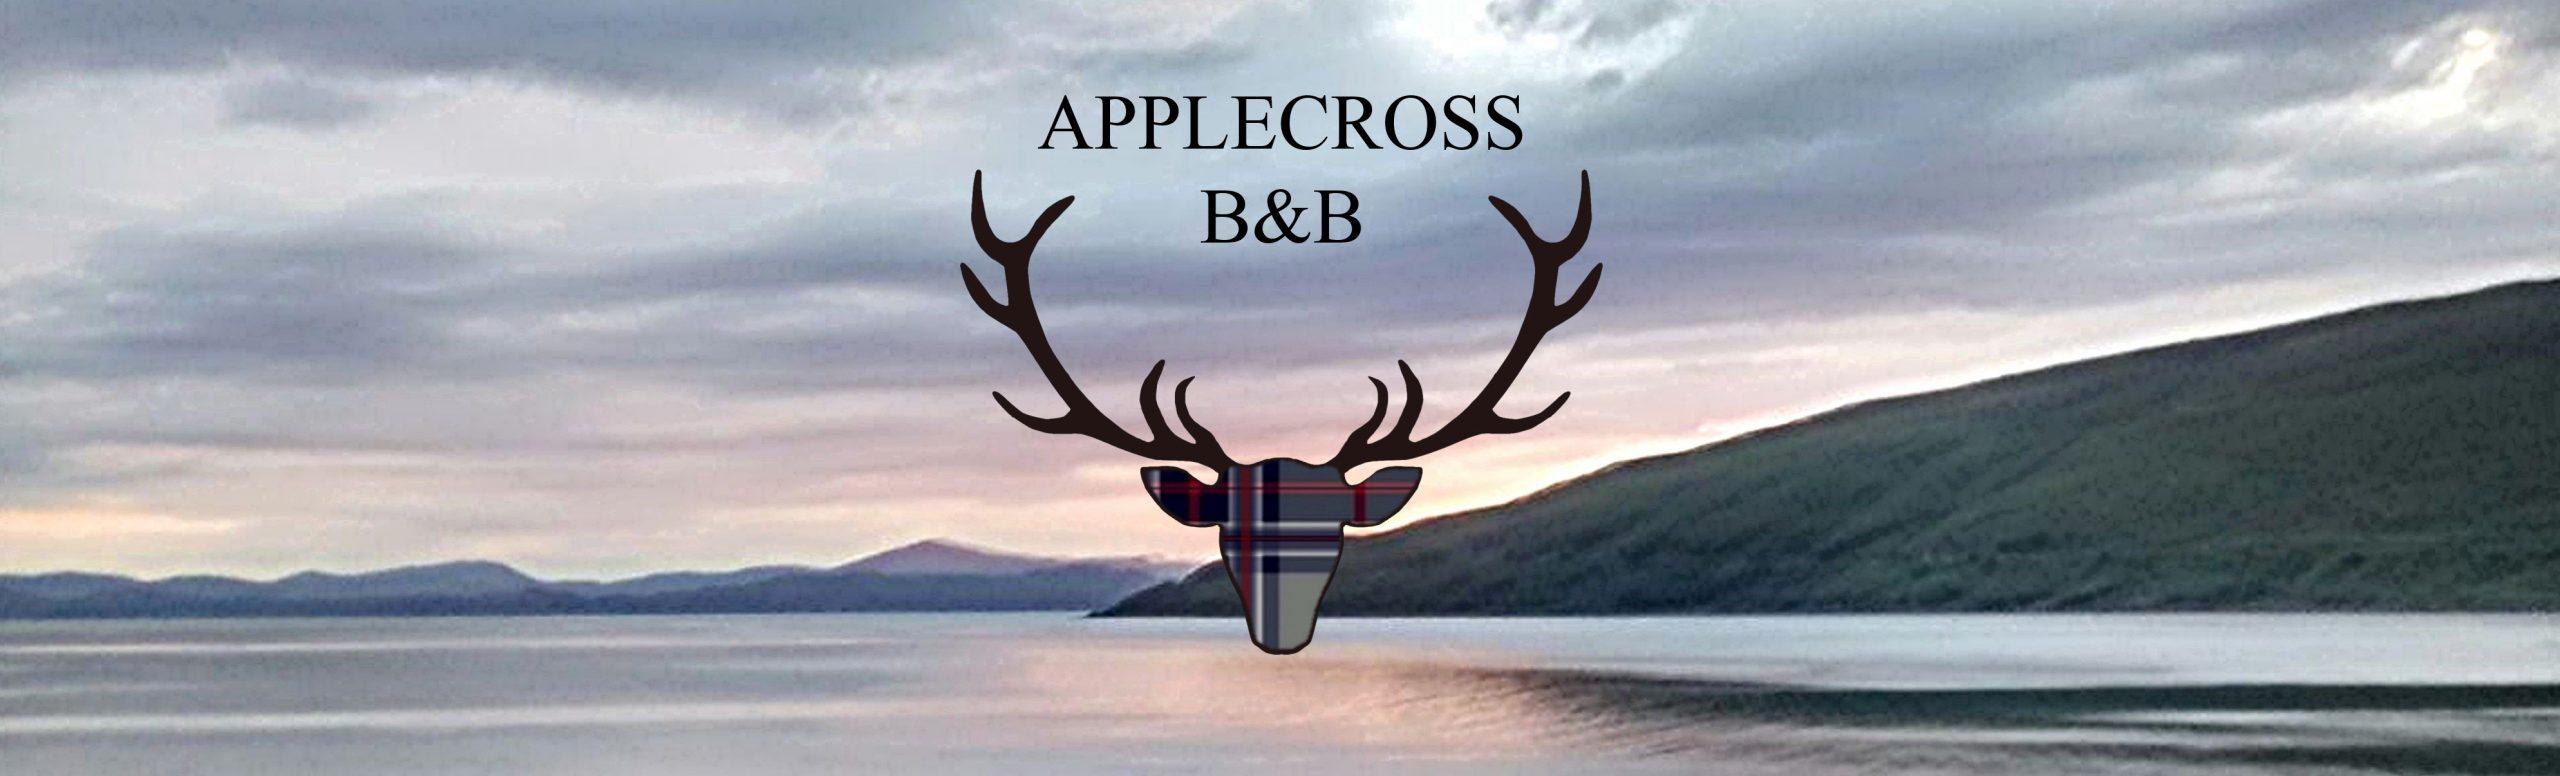 Apple cross B&B